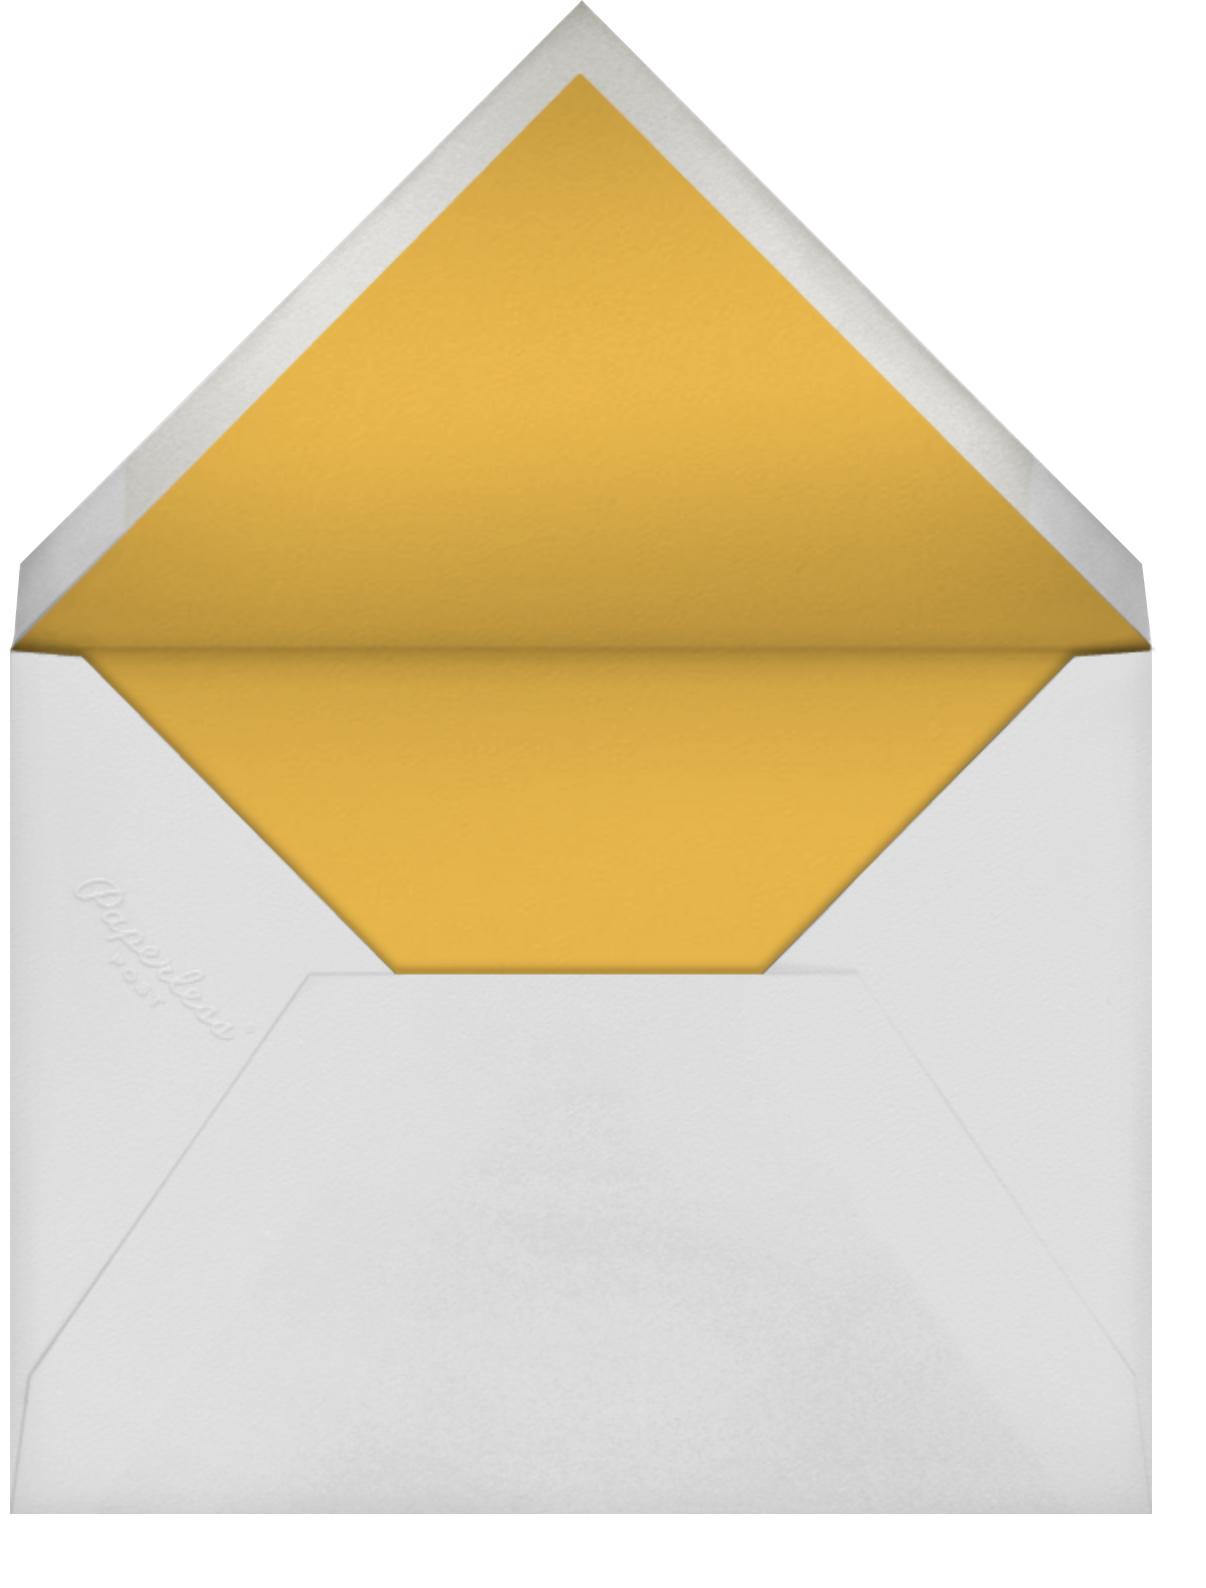 Pressed Greenery - Meringue - Oscar de la Renta - General entertaining - envelope back